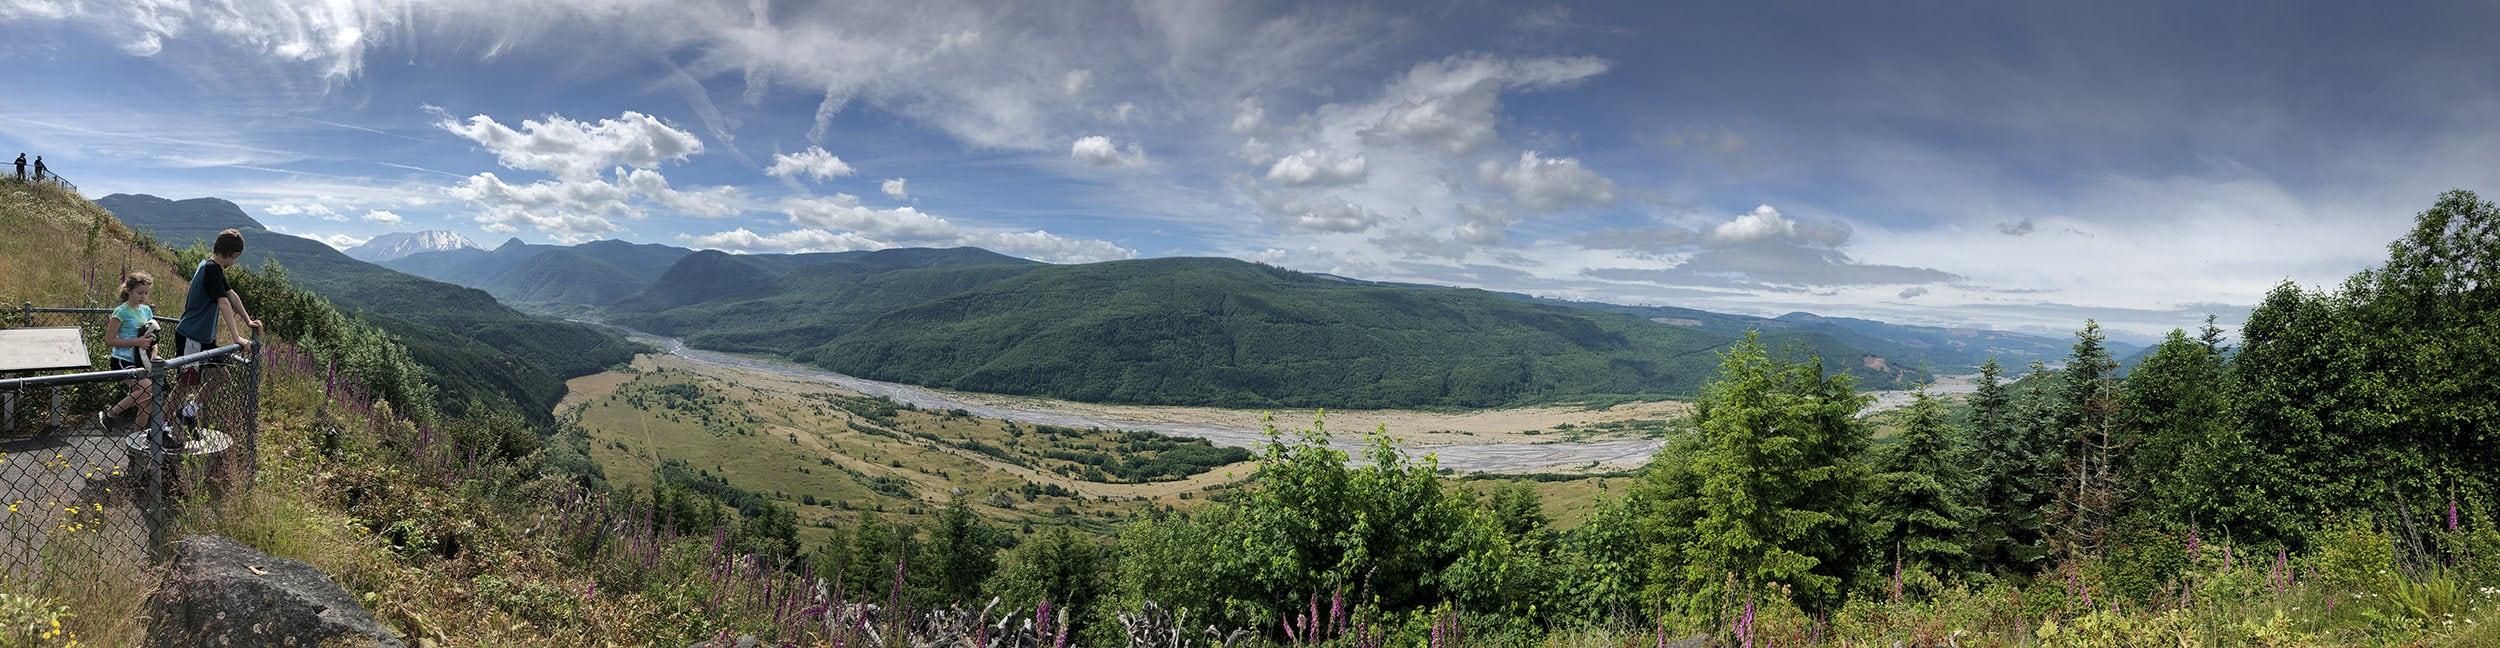 Amazing view of Mt Saint helens